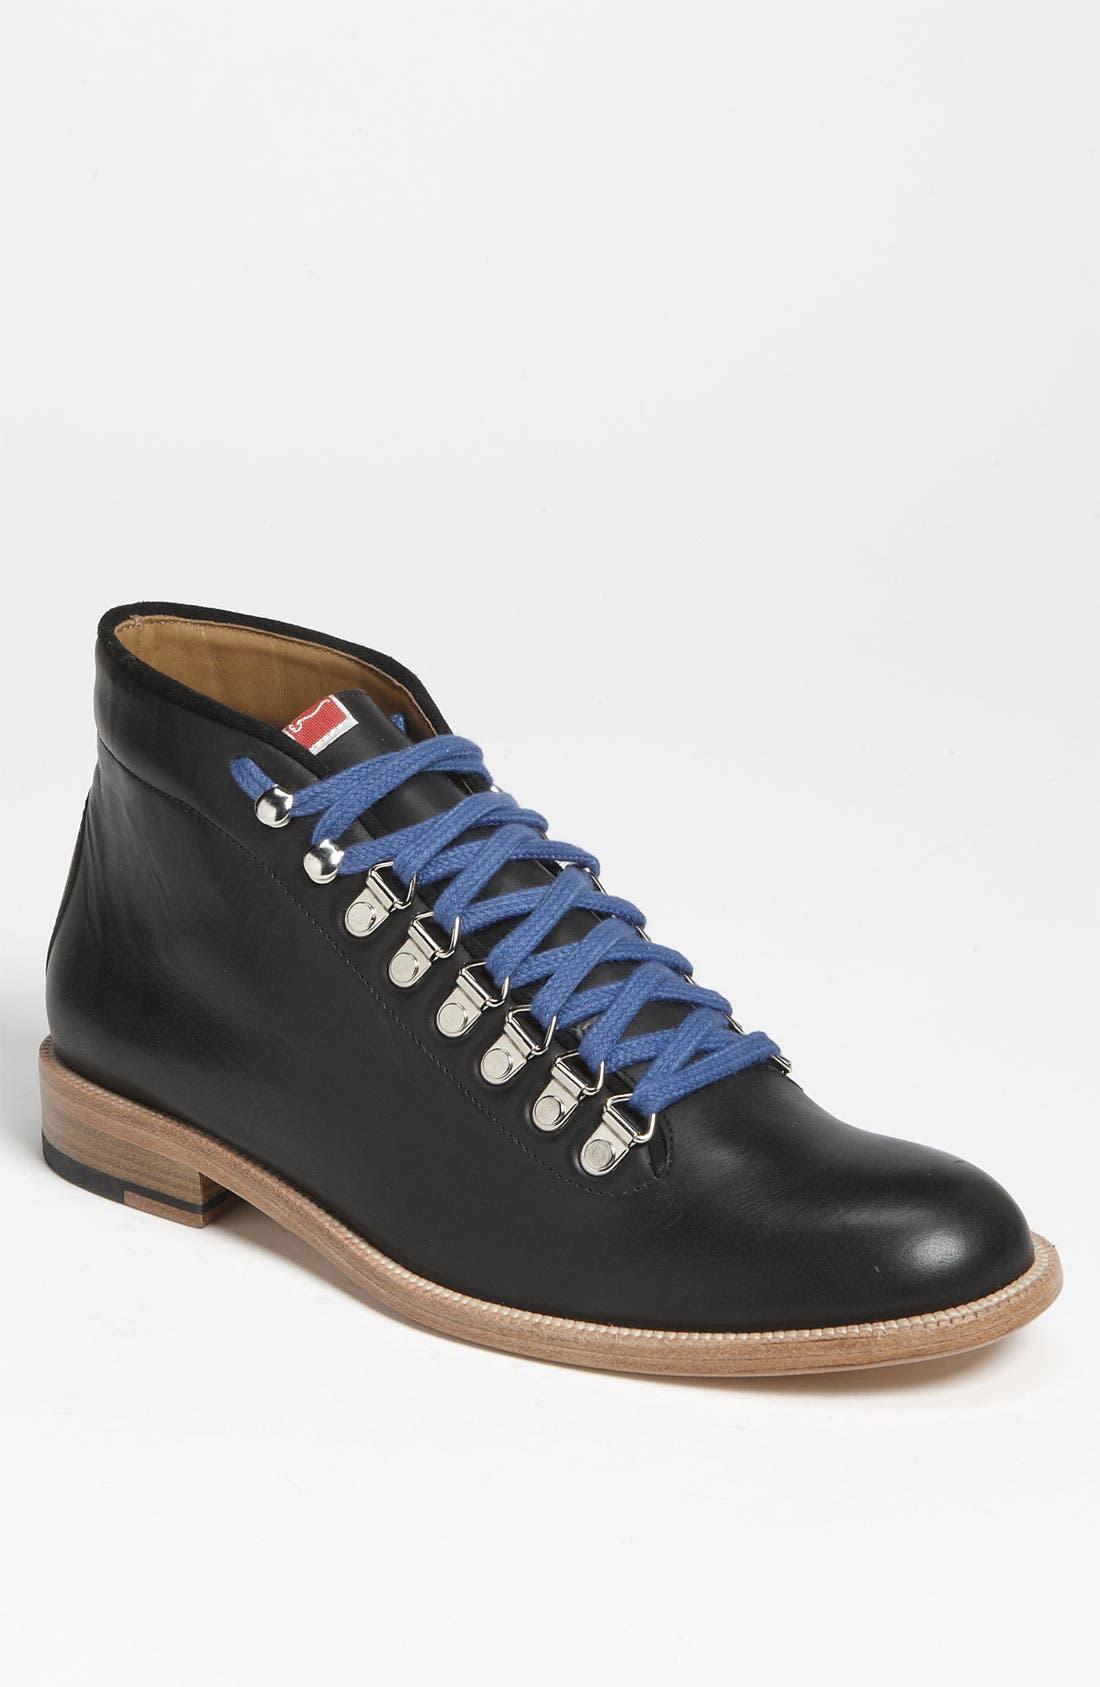 Main Image - Shipley & Halmos 'Nederland' Boot